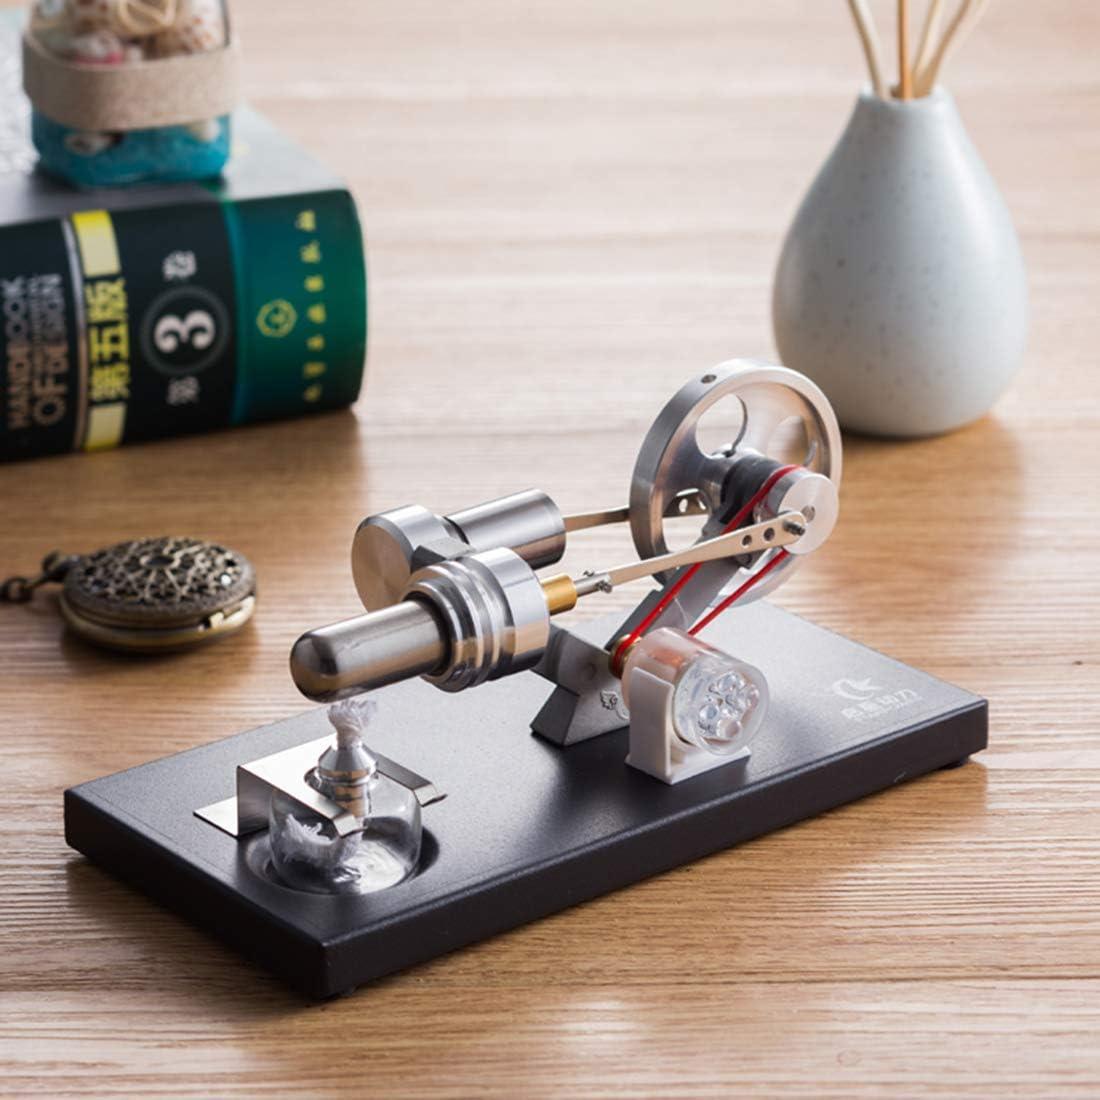 Mini Hot Creative Air Stirling Motor Motormodell Lernspielzeug UFO Spin DIY